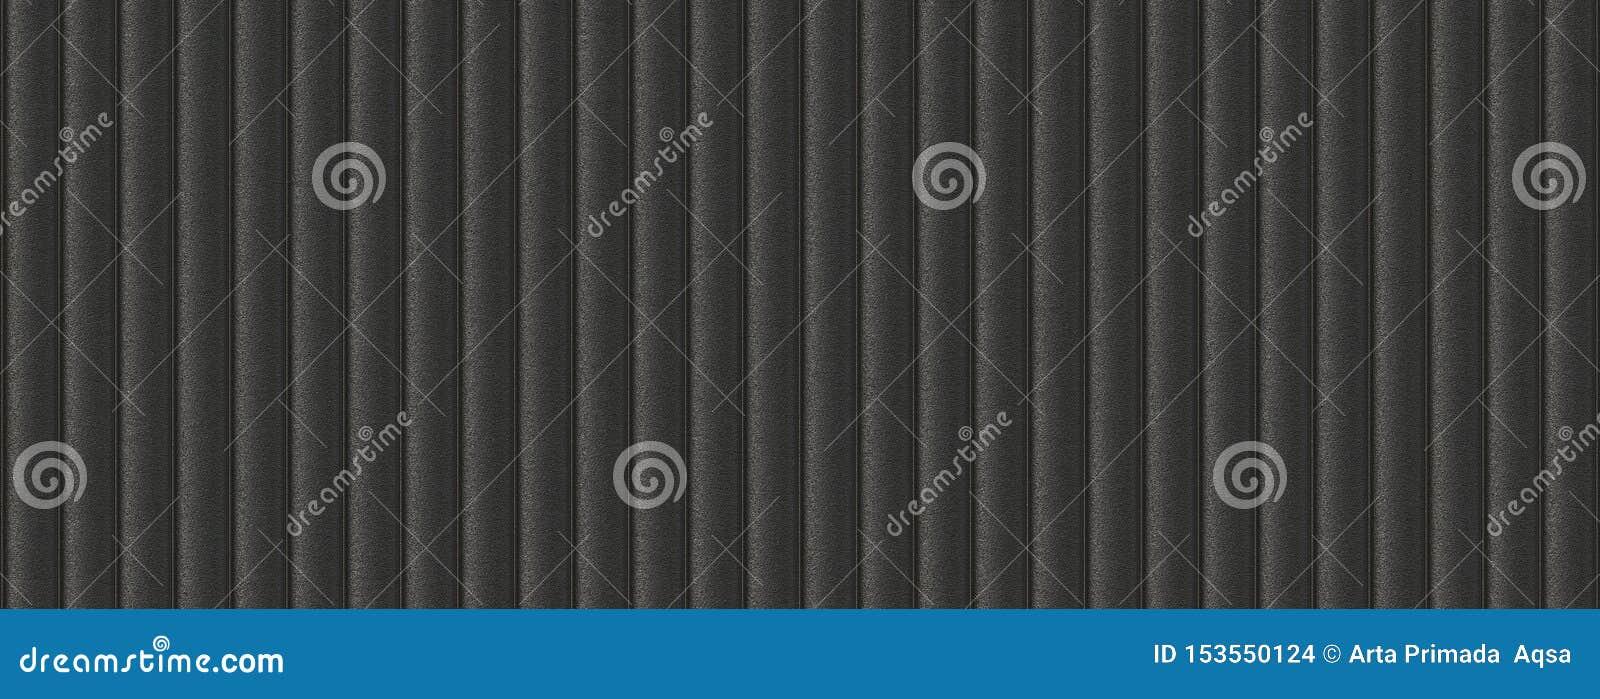 3d illustration sofa leather black seamless background